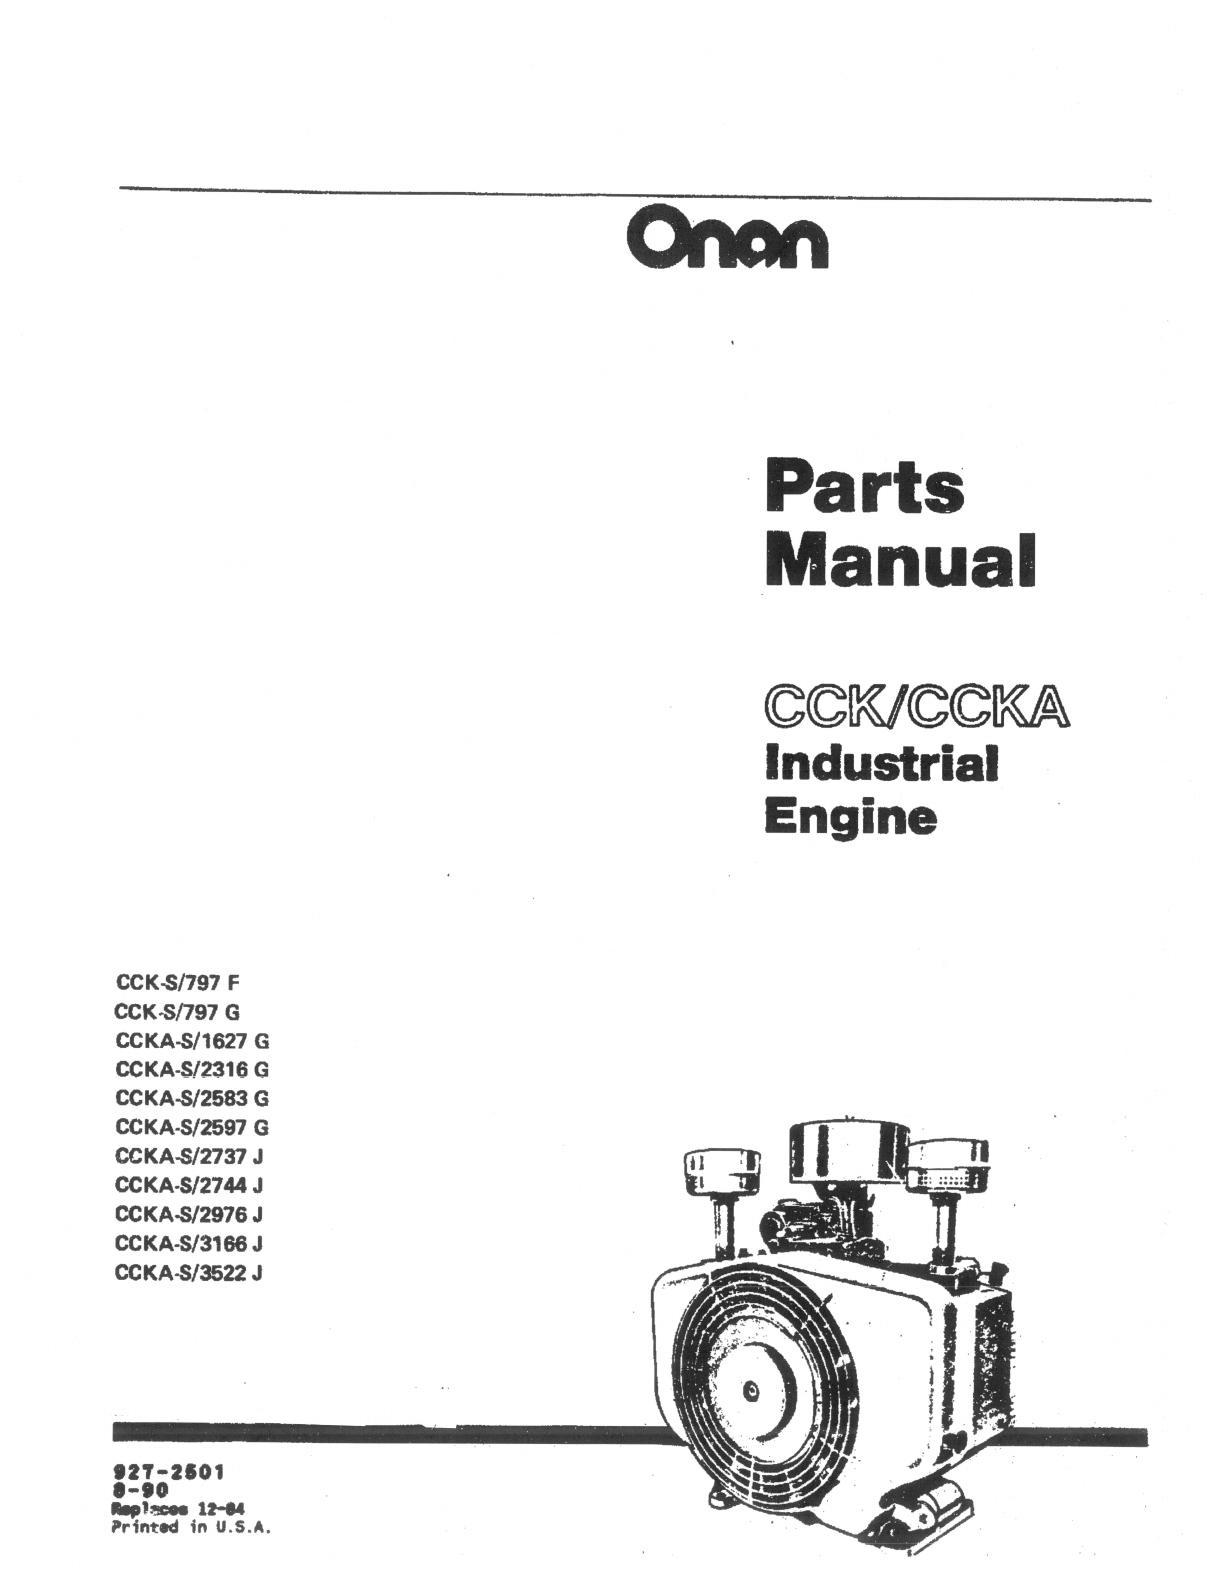 Vicb4 927 Onan Cck Ccka Industrial Engine Parts